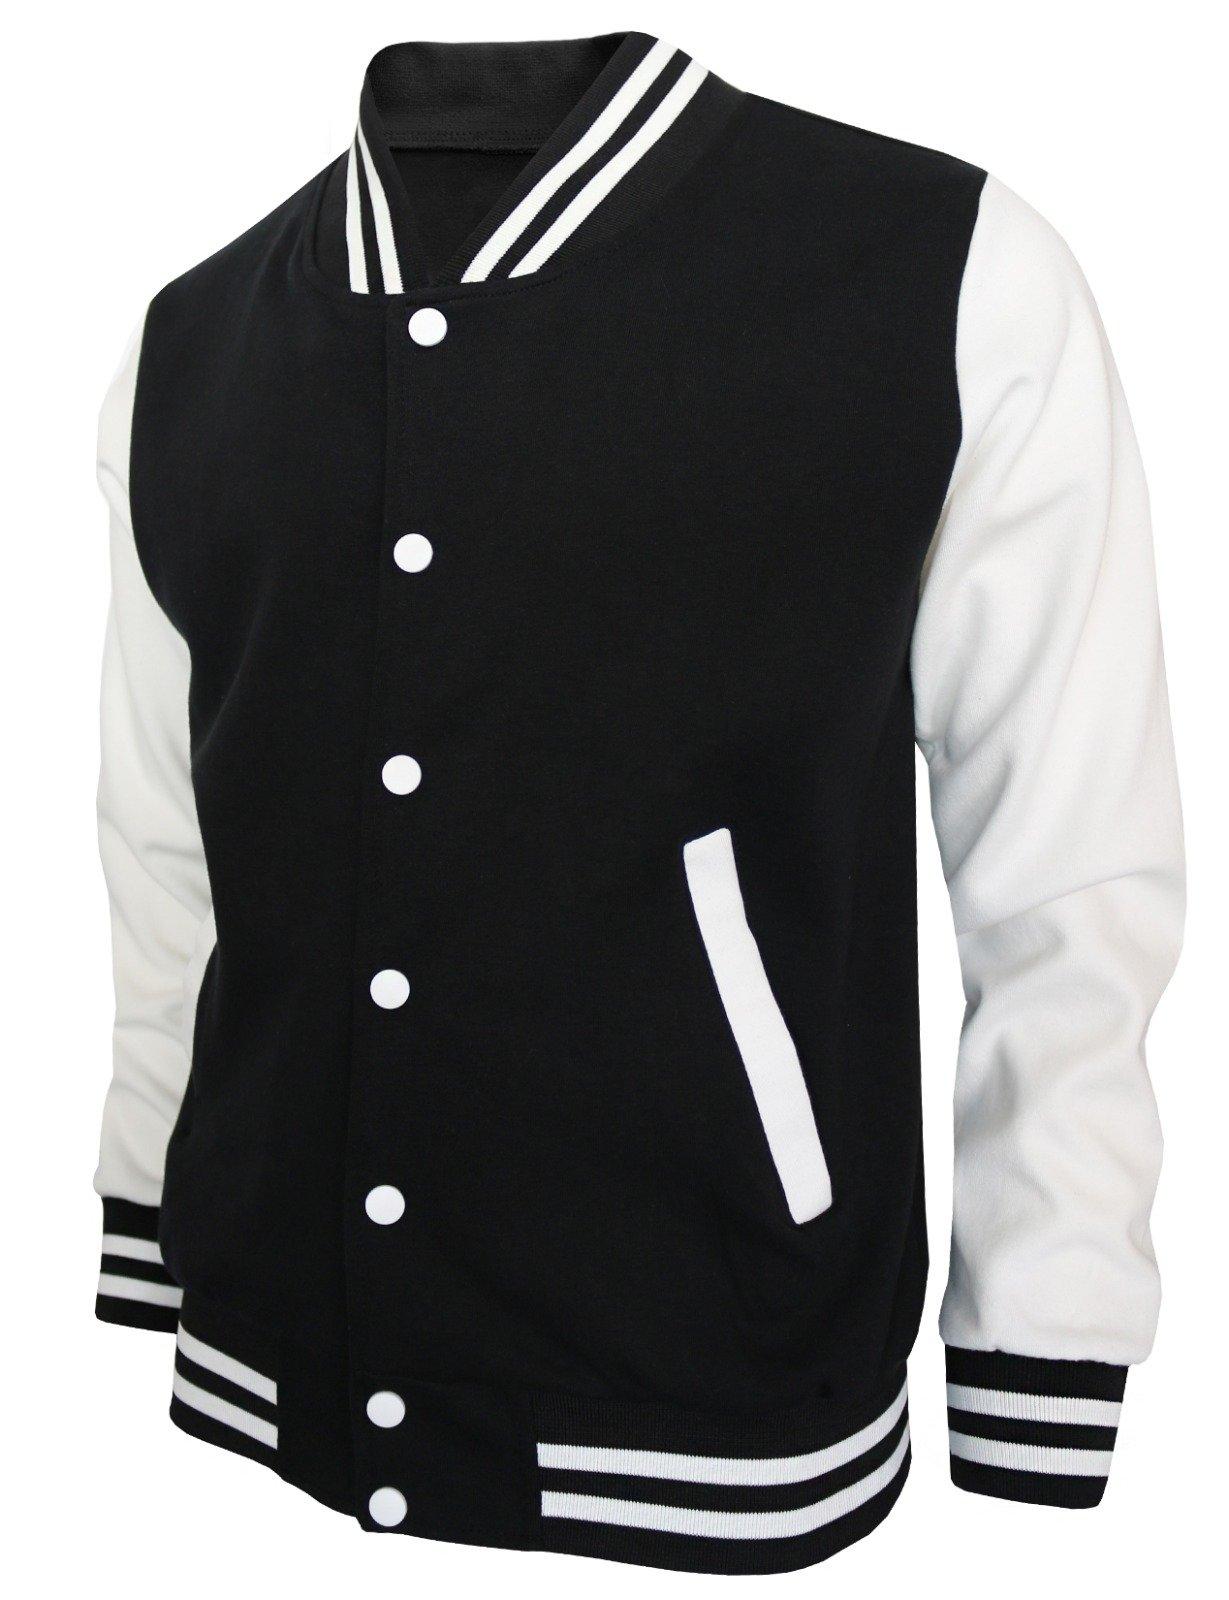 BCPOLO Baseball Jacket Varsity Baseball Cotton Jacket Letterman Jacket 8 Colors-Black XS by BCPOLO